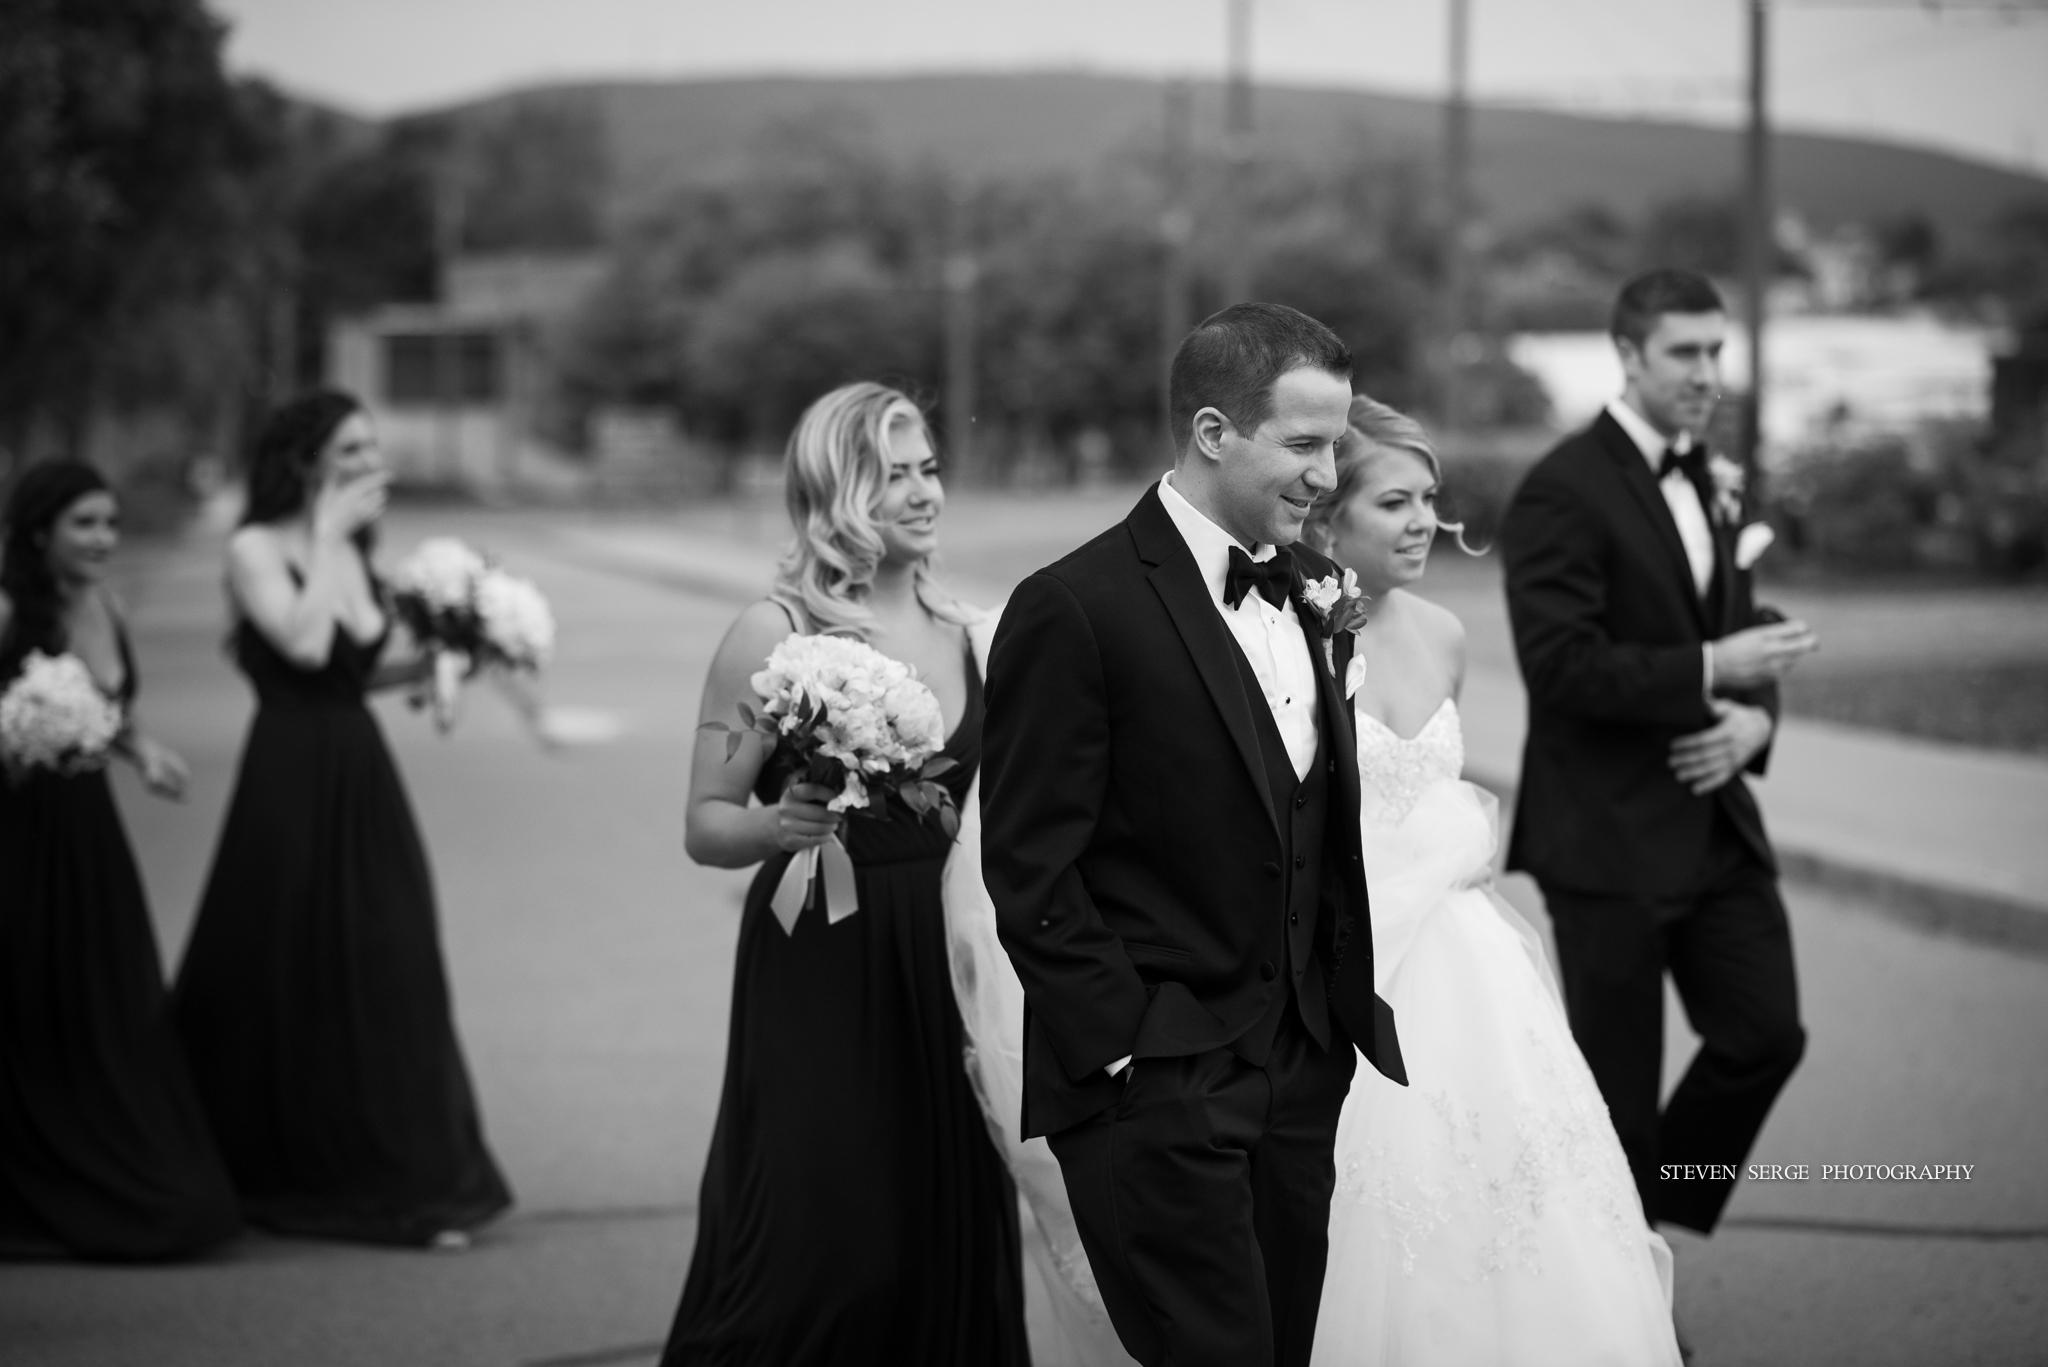 scranton-wedding-photographers-hilton-steven-serge-photography-1.jpg